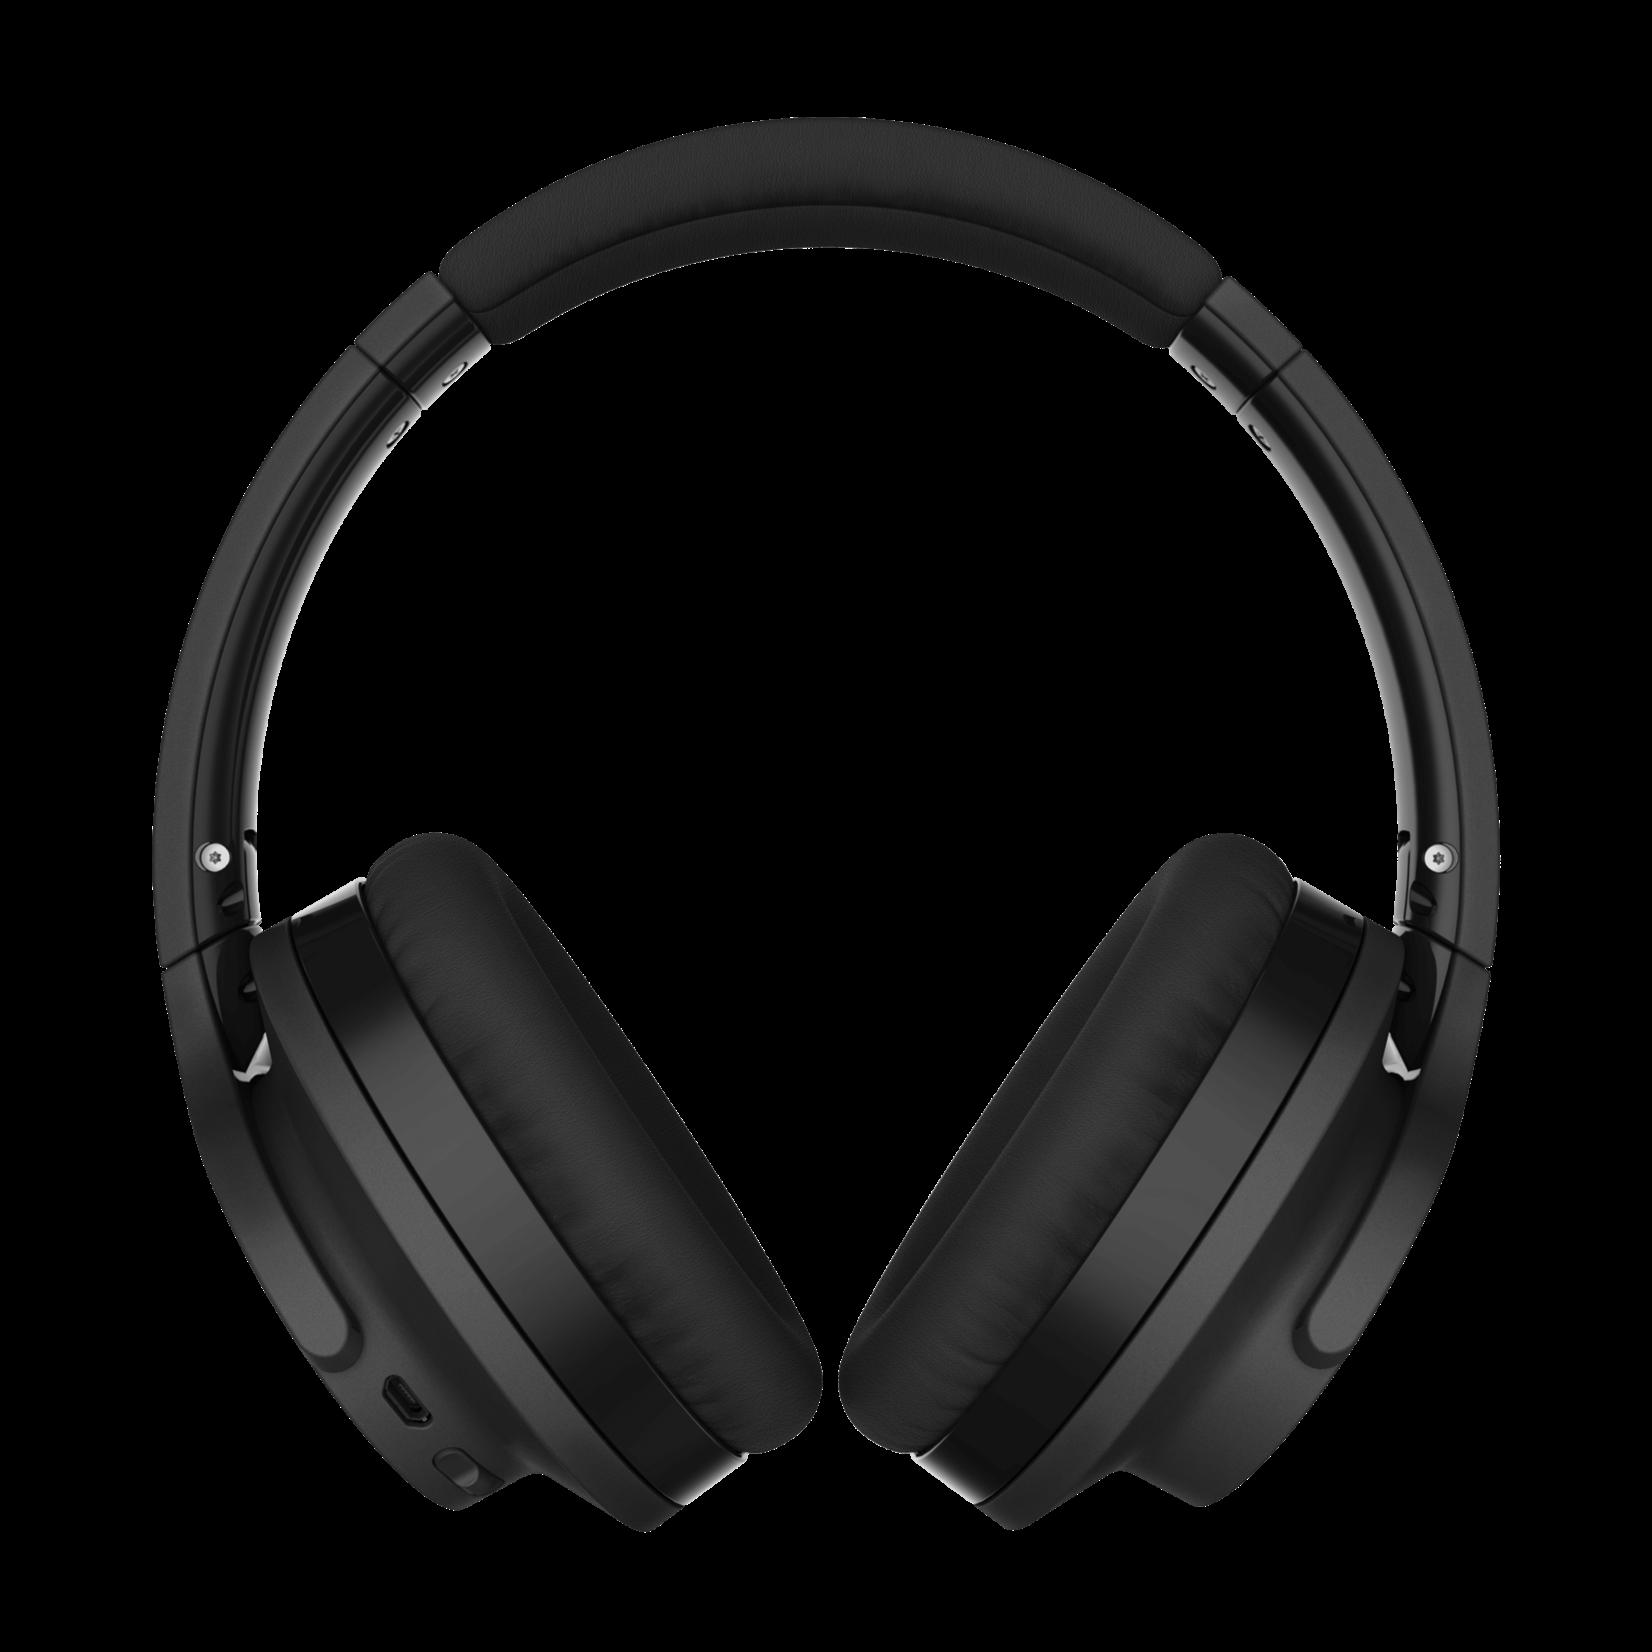 AUDIO-TECHNICA ATH-ANC700BTBK WIRELESS NOISE-CANCELLING HEADPHONES